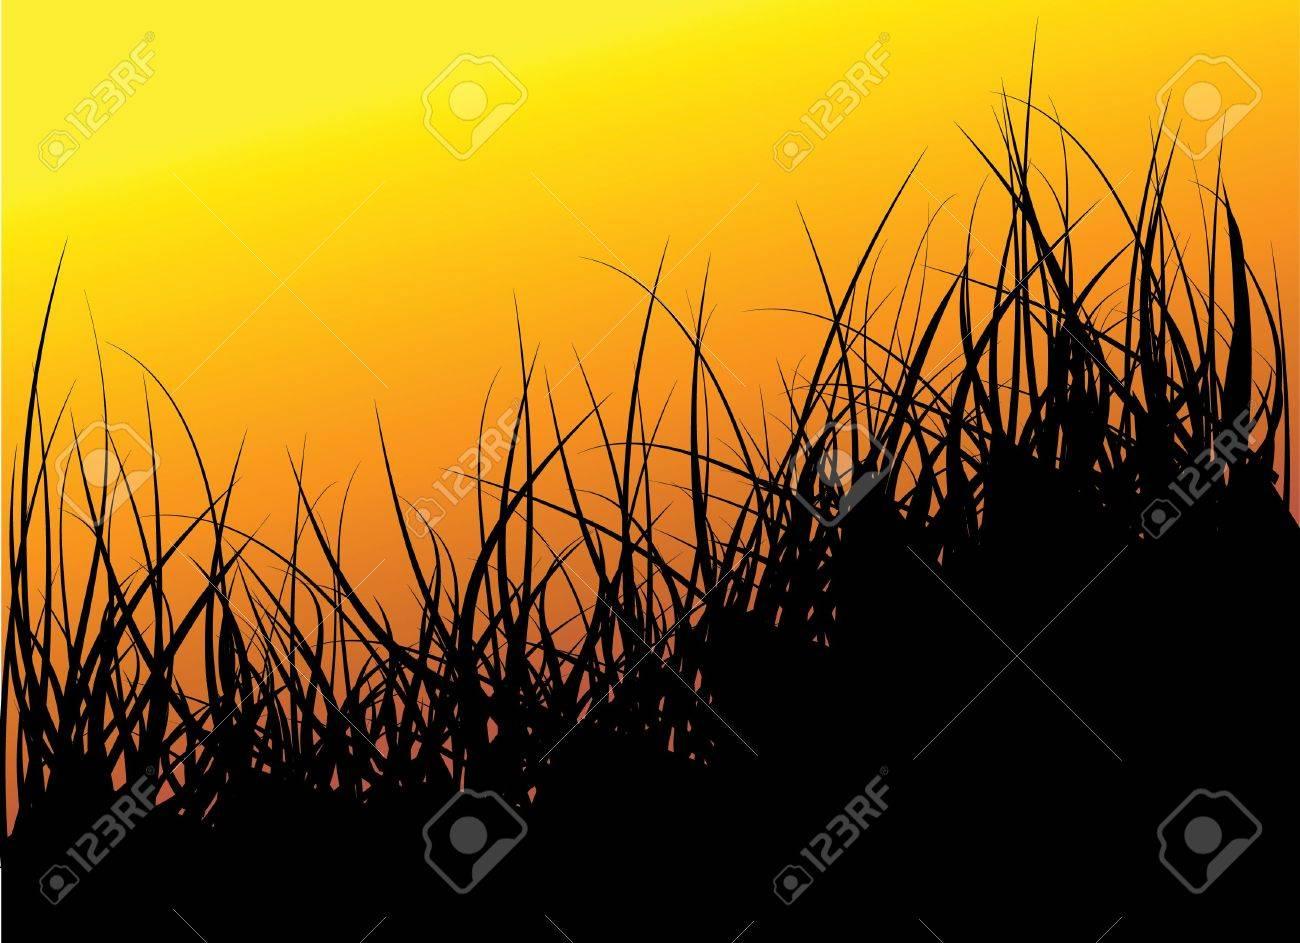 Green grass background - sunset Stock Photo - 5740890